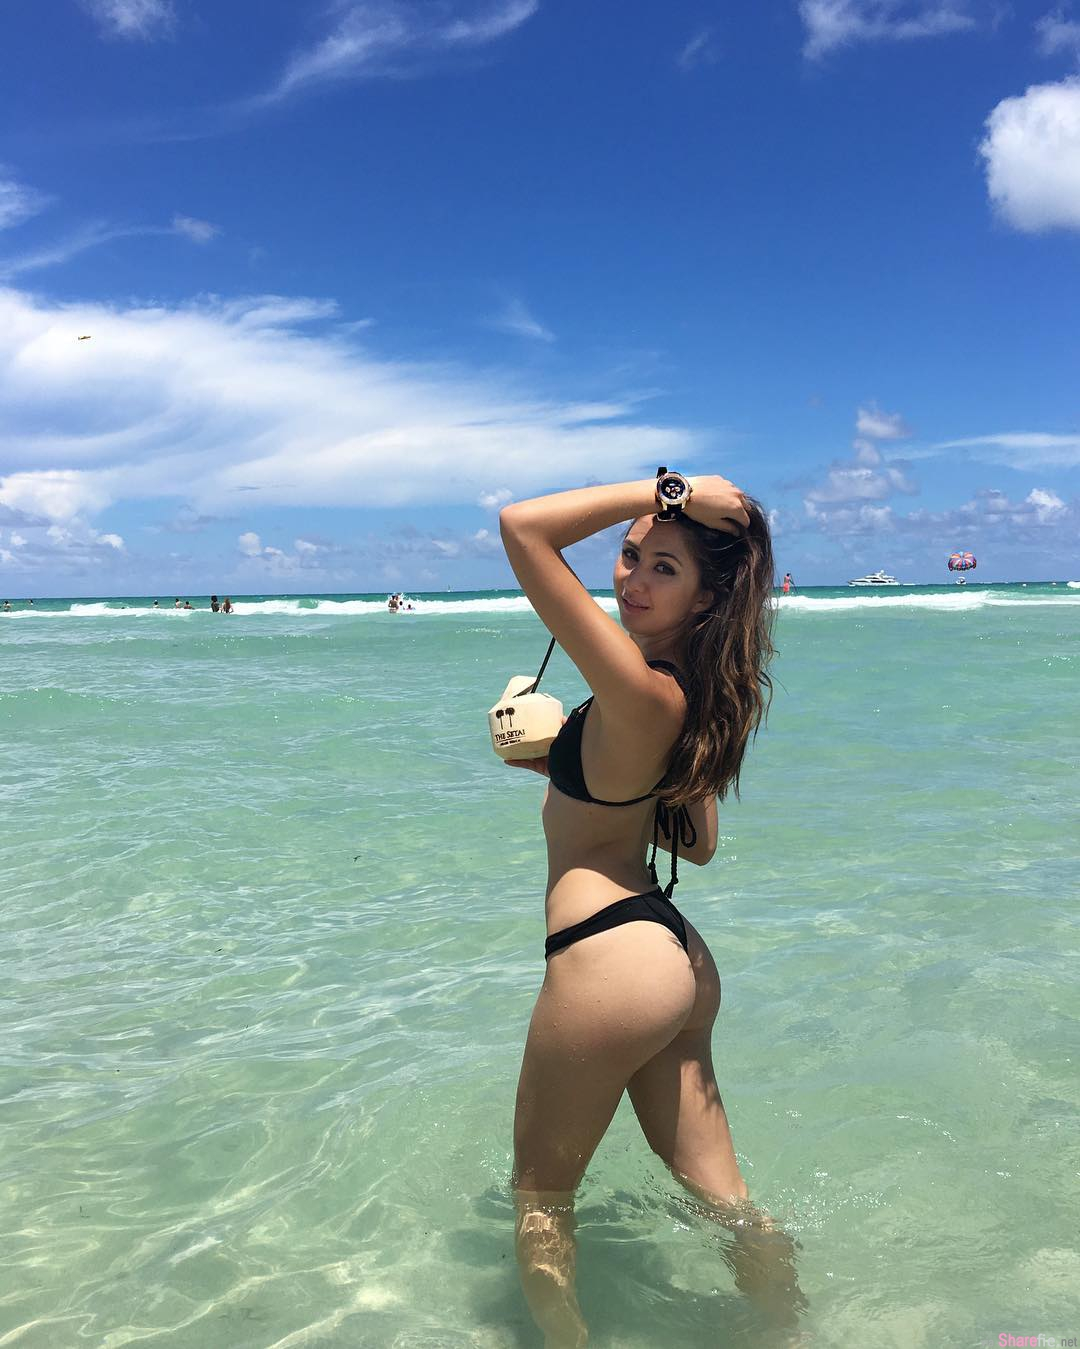 夏威夷美女 Lauren Rhoden 极品好身材